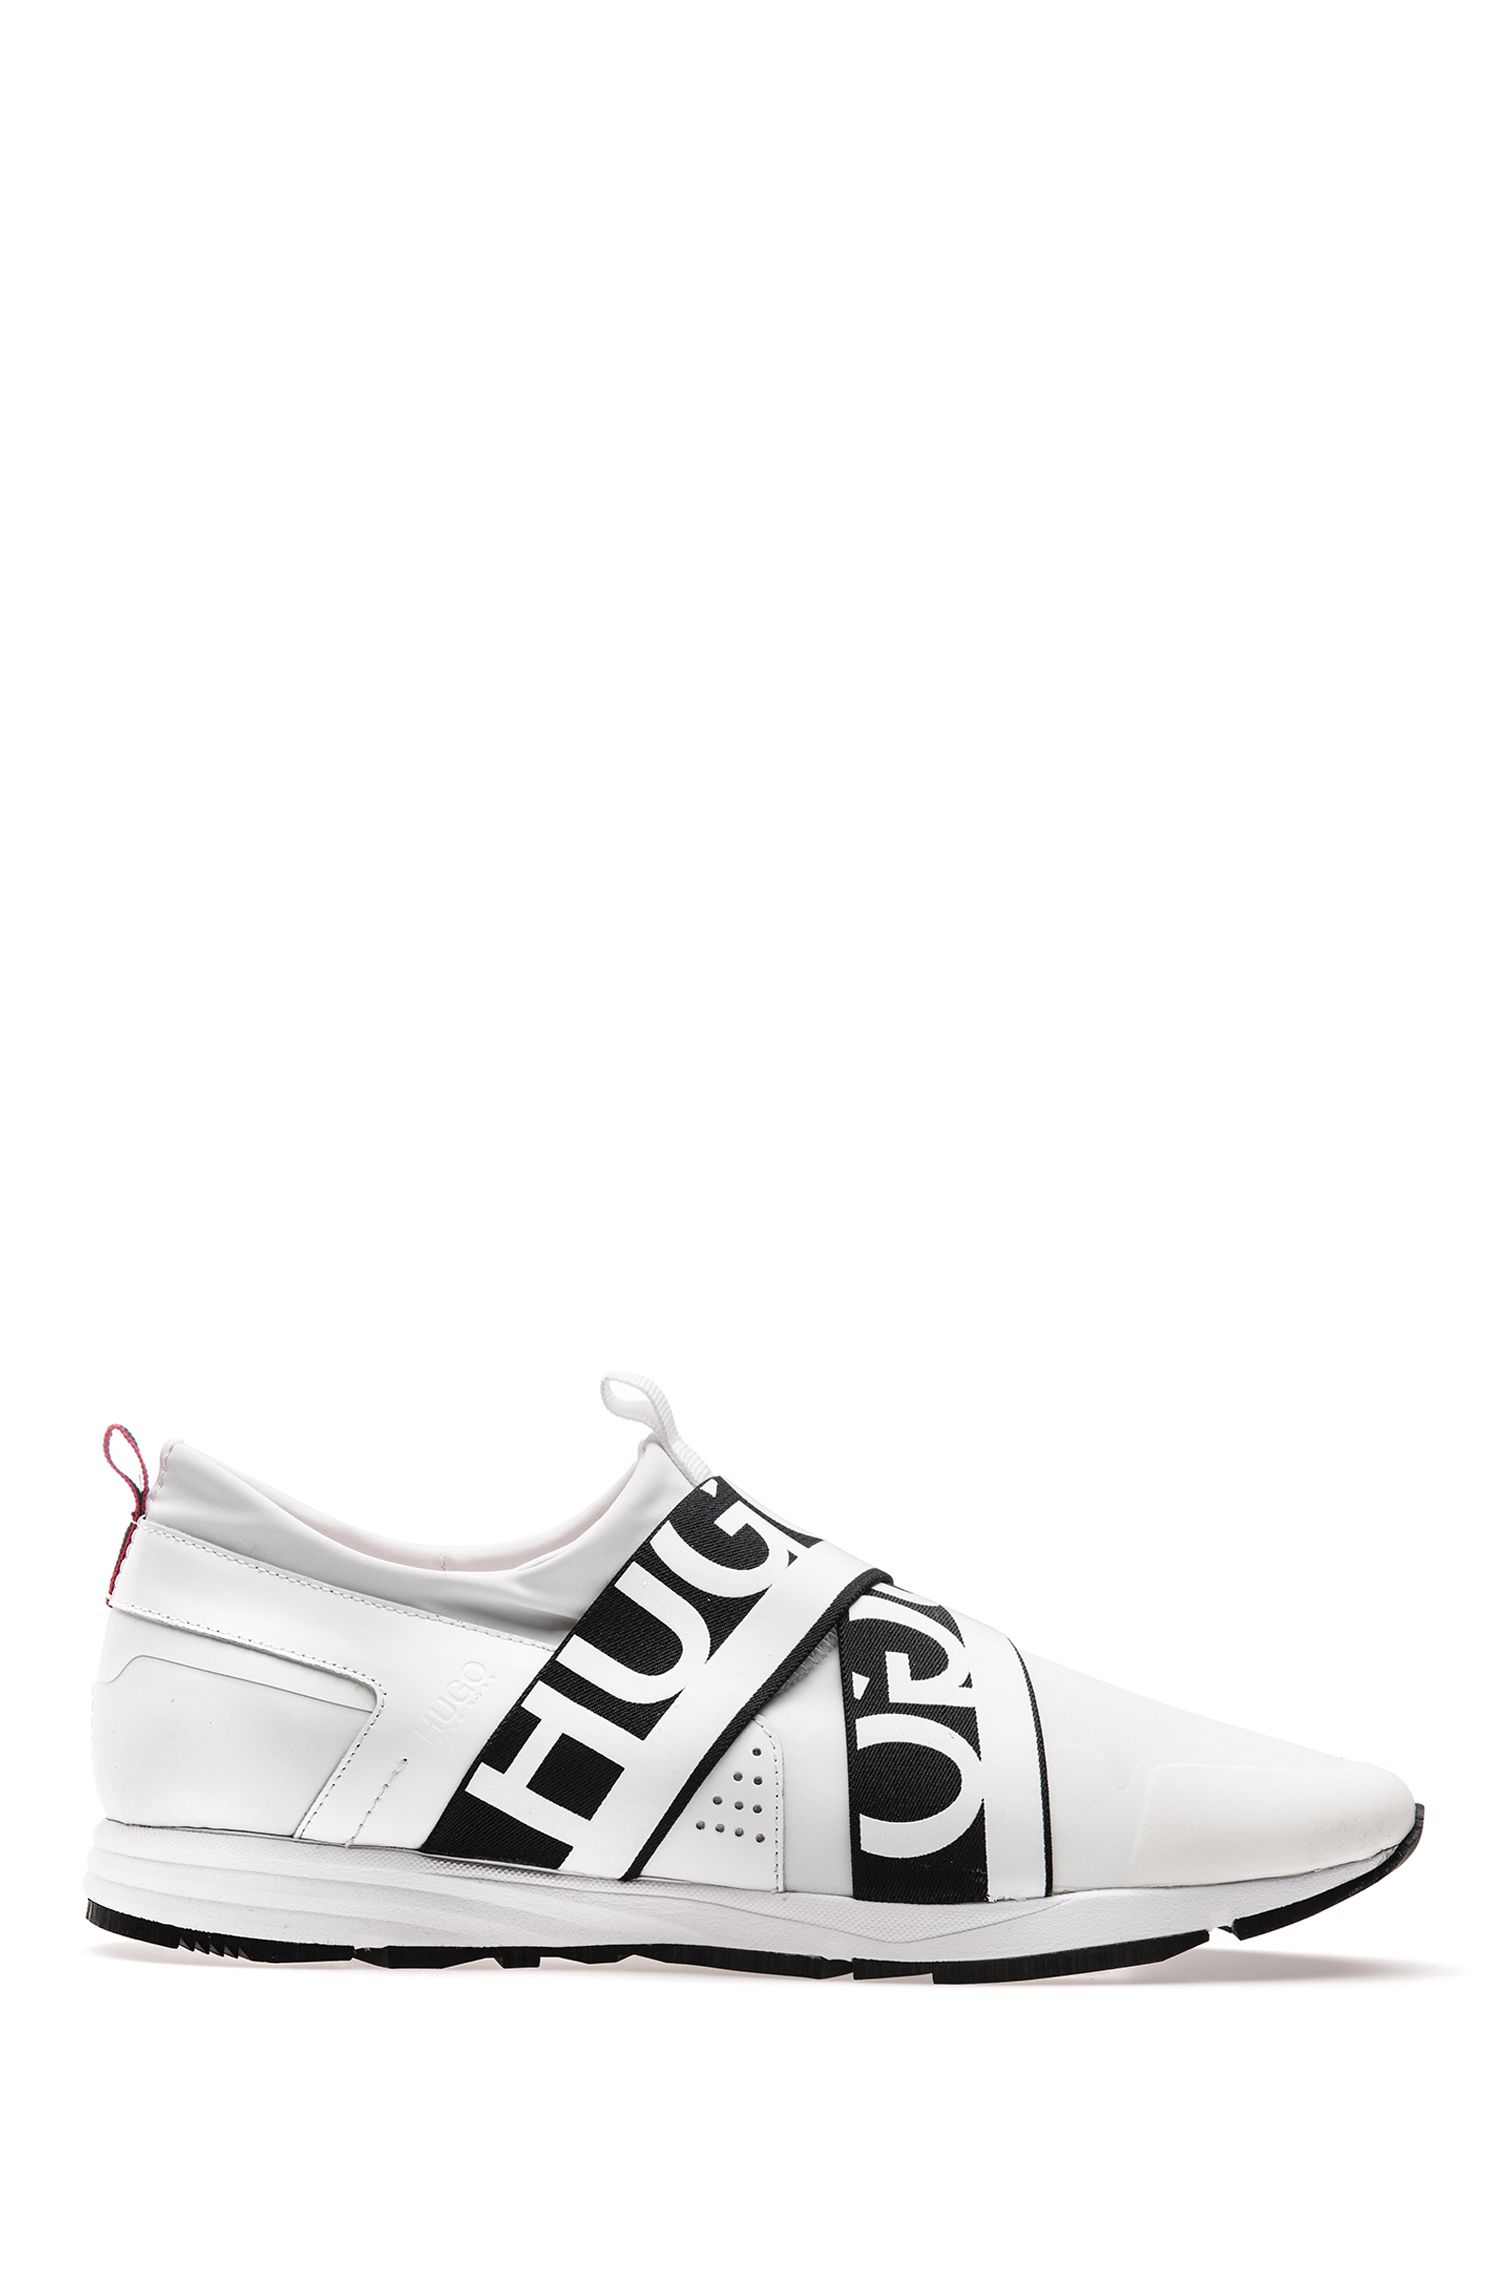 Sneakers mit Logo-Schriftzug